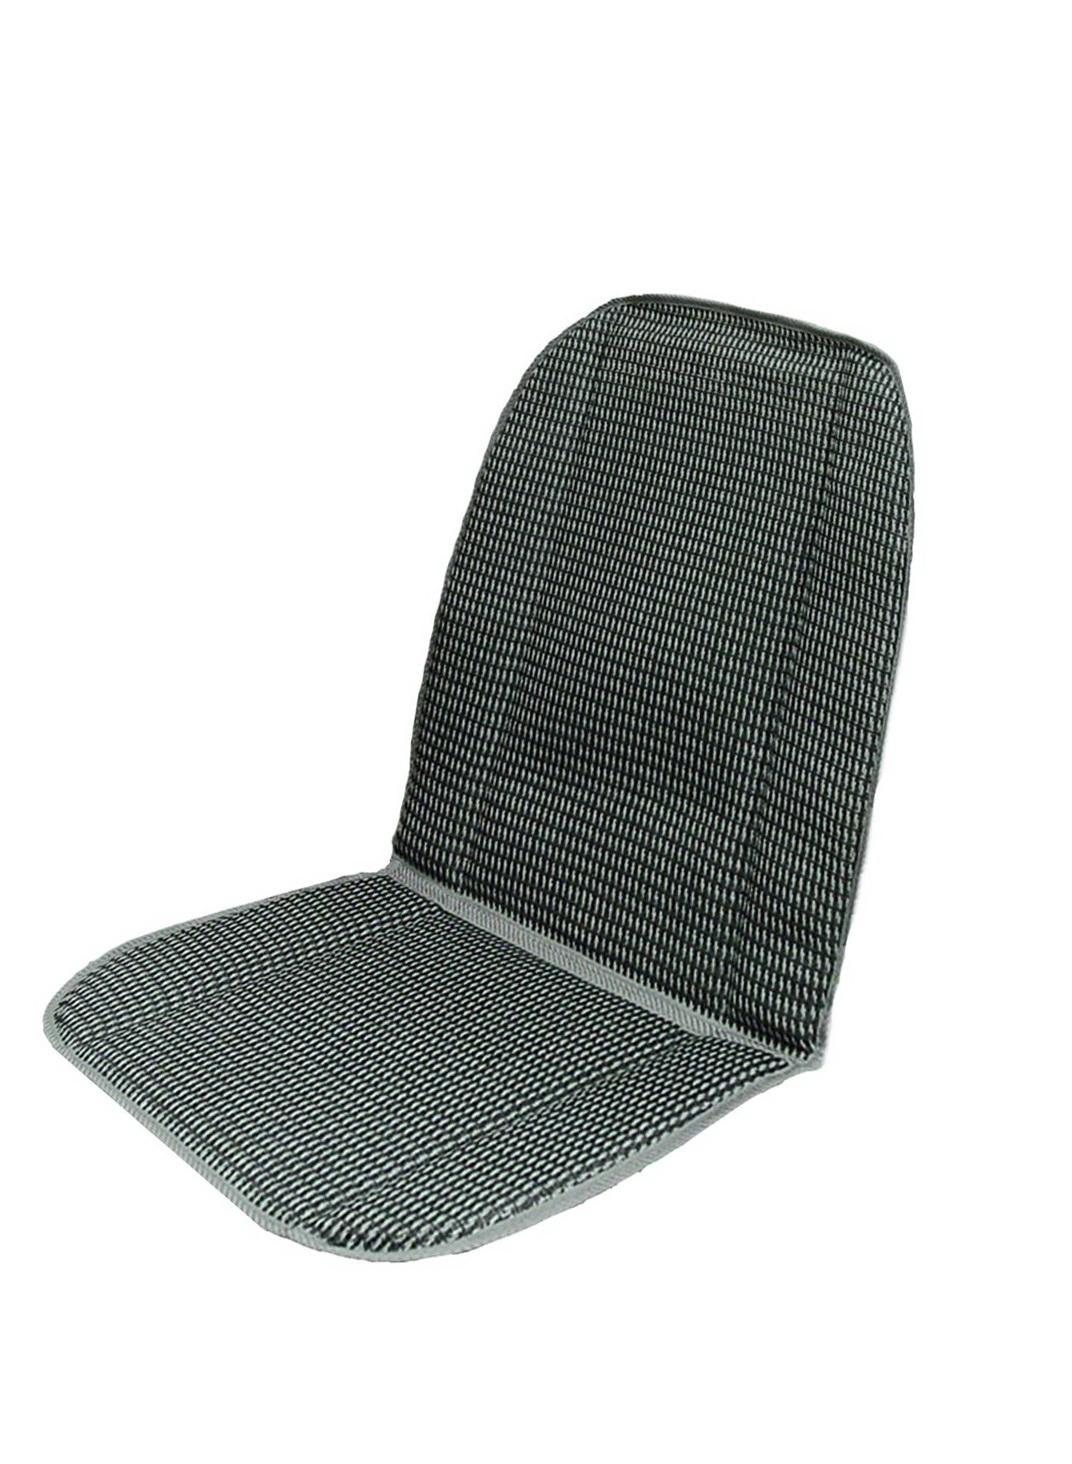 Heated Car Seat Cushion With Auto Shut Off